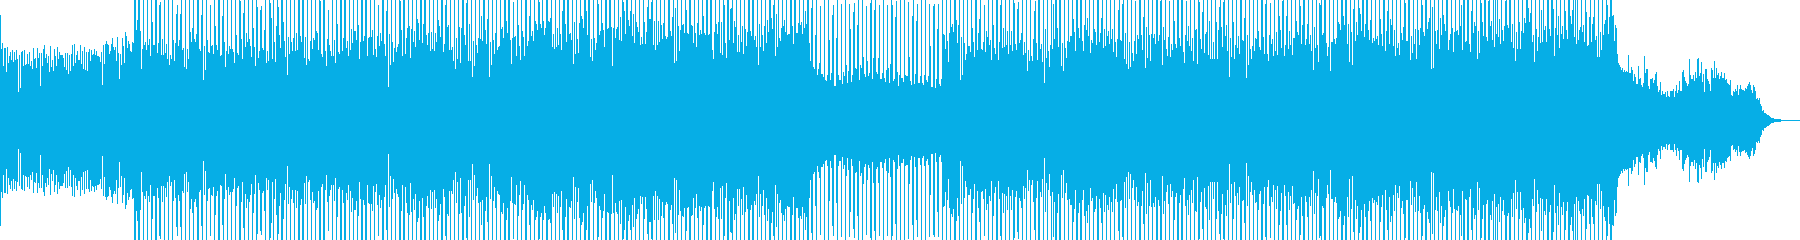 EDMオープニング企業VPイベント-18の再生済みの波形